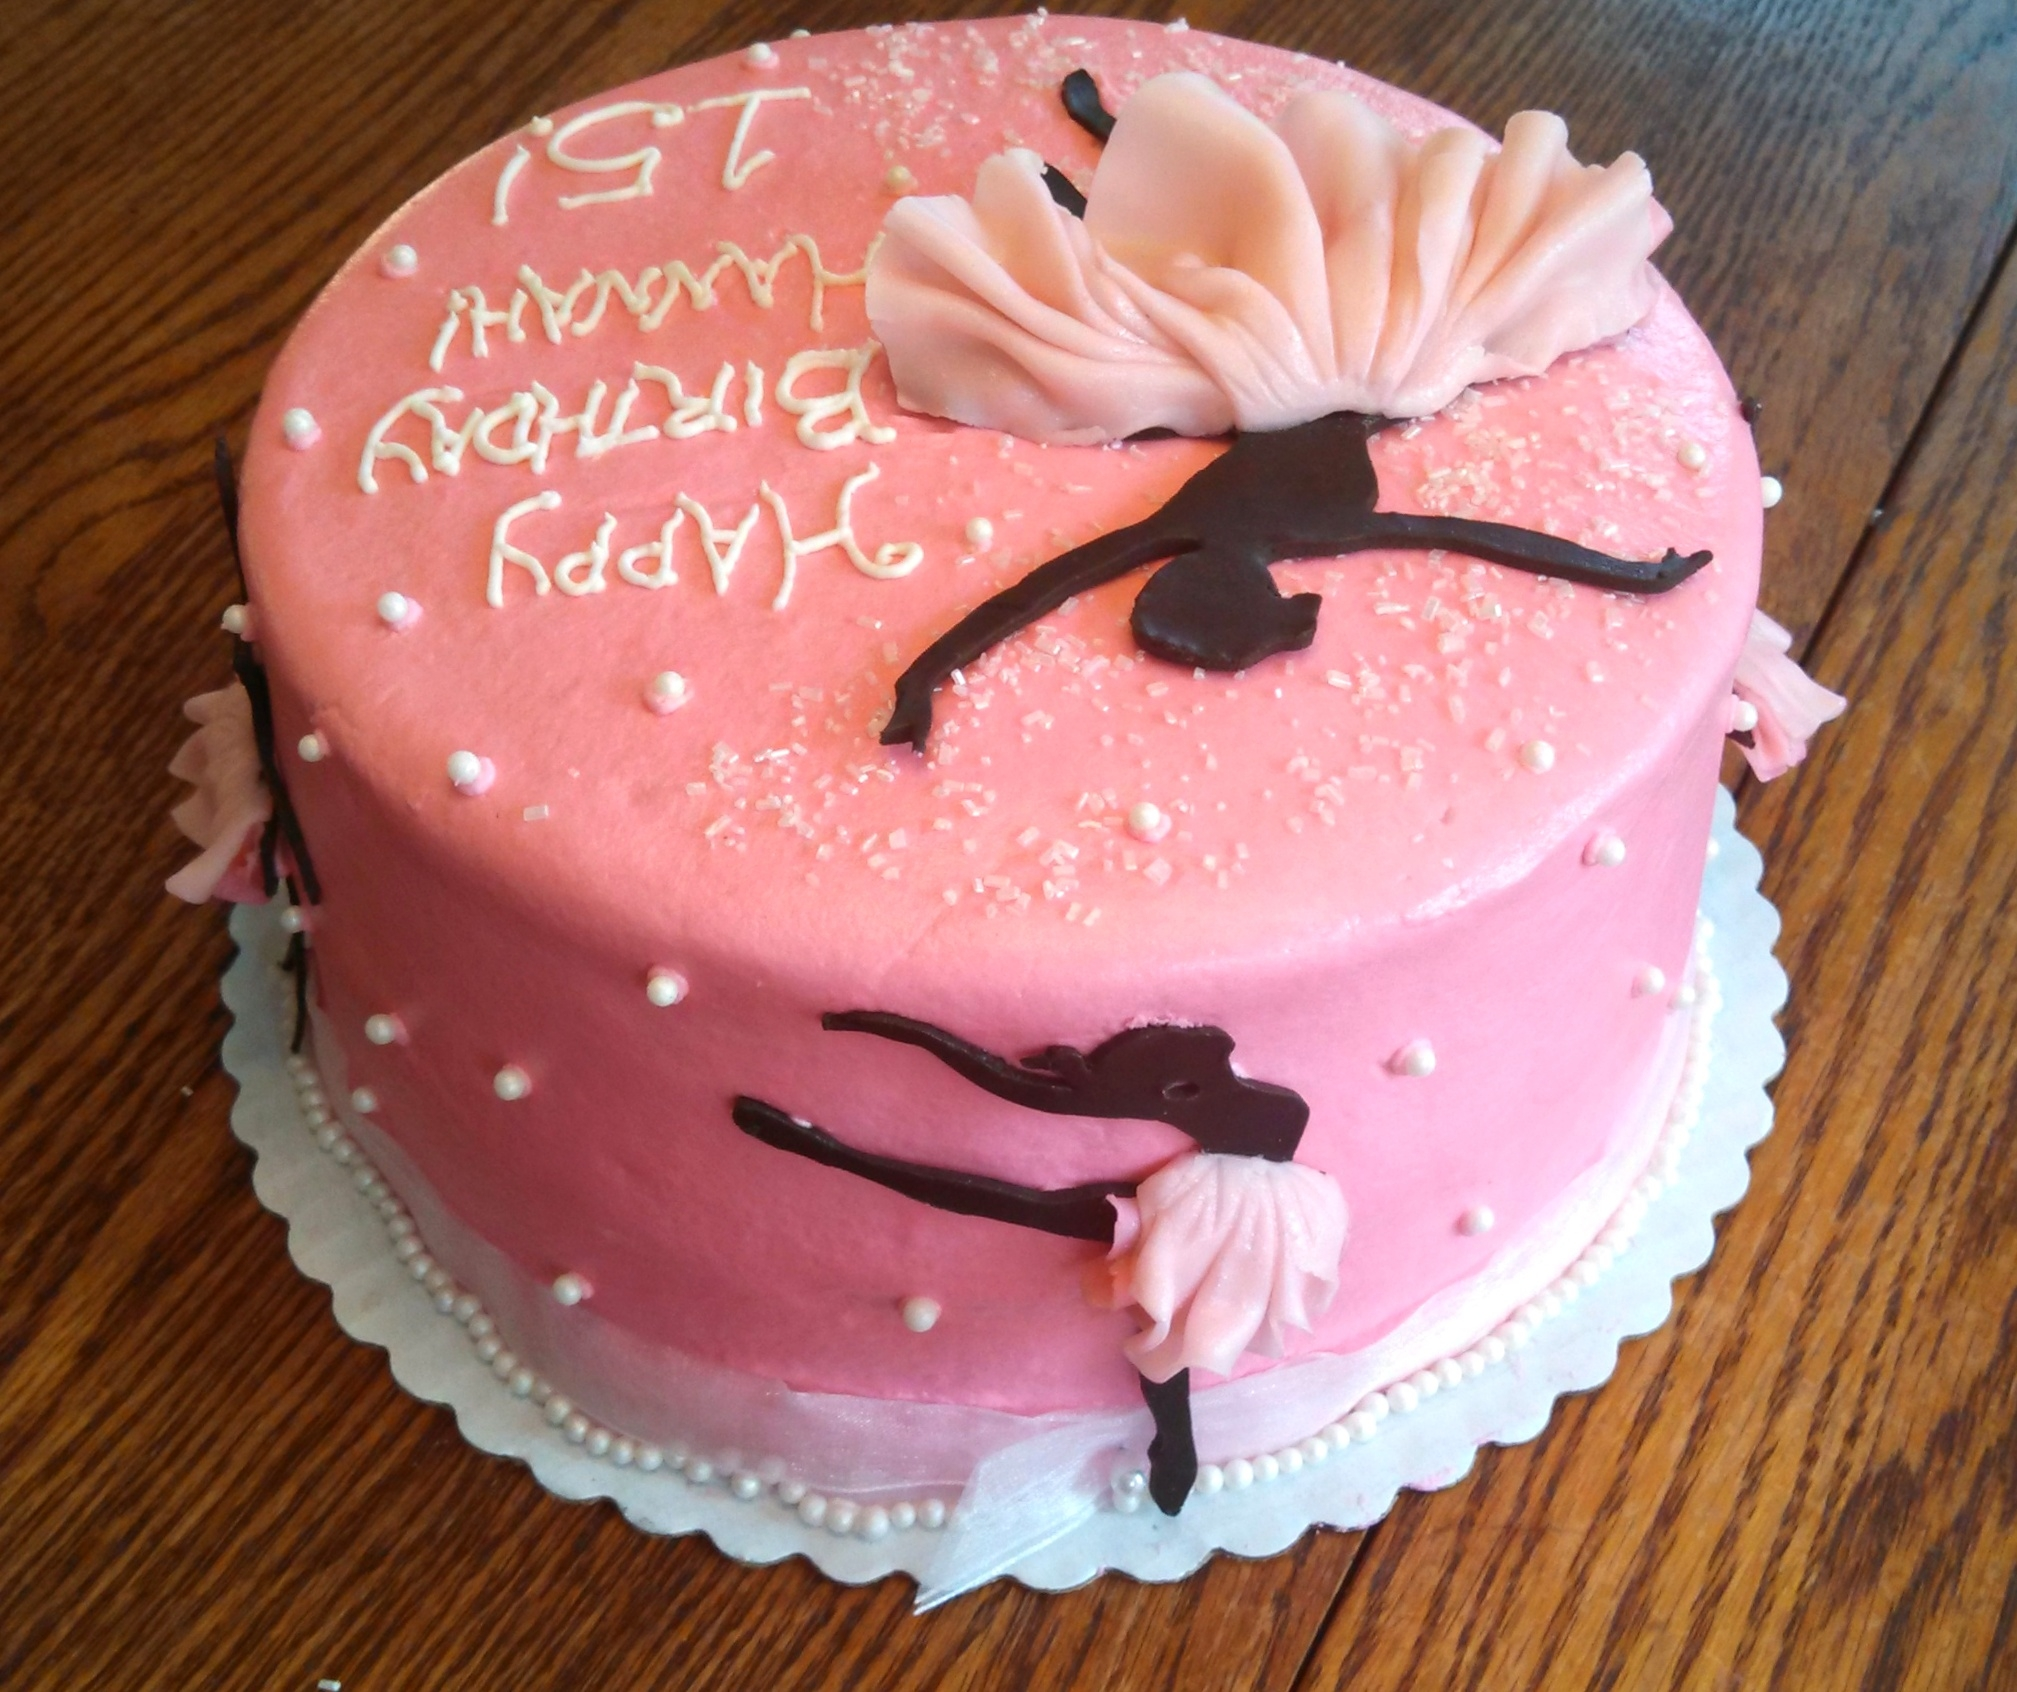 Cakecentral Com: Ballerina Silhouette Cake